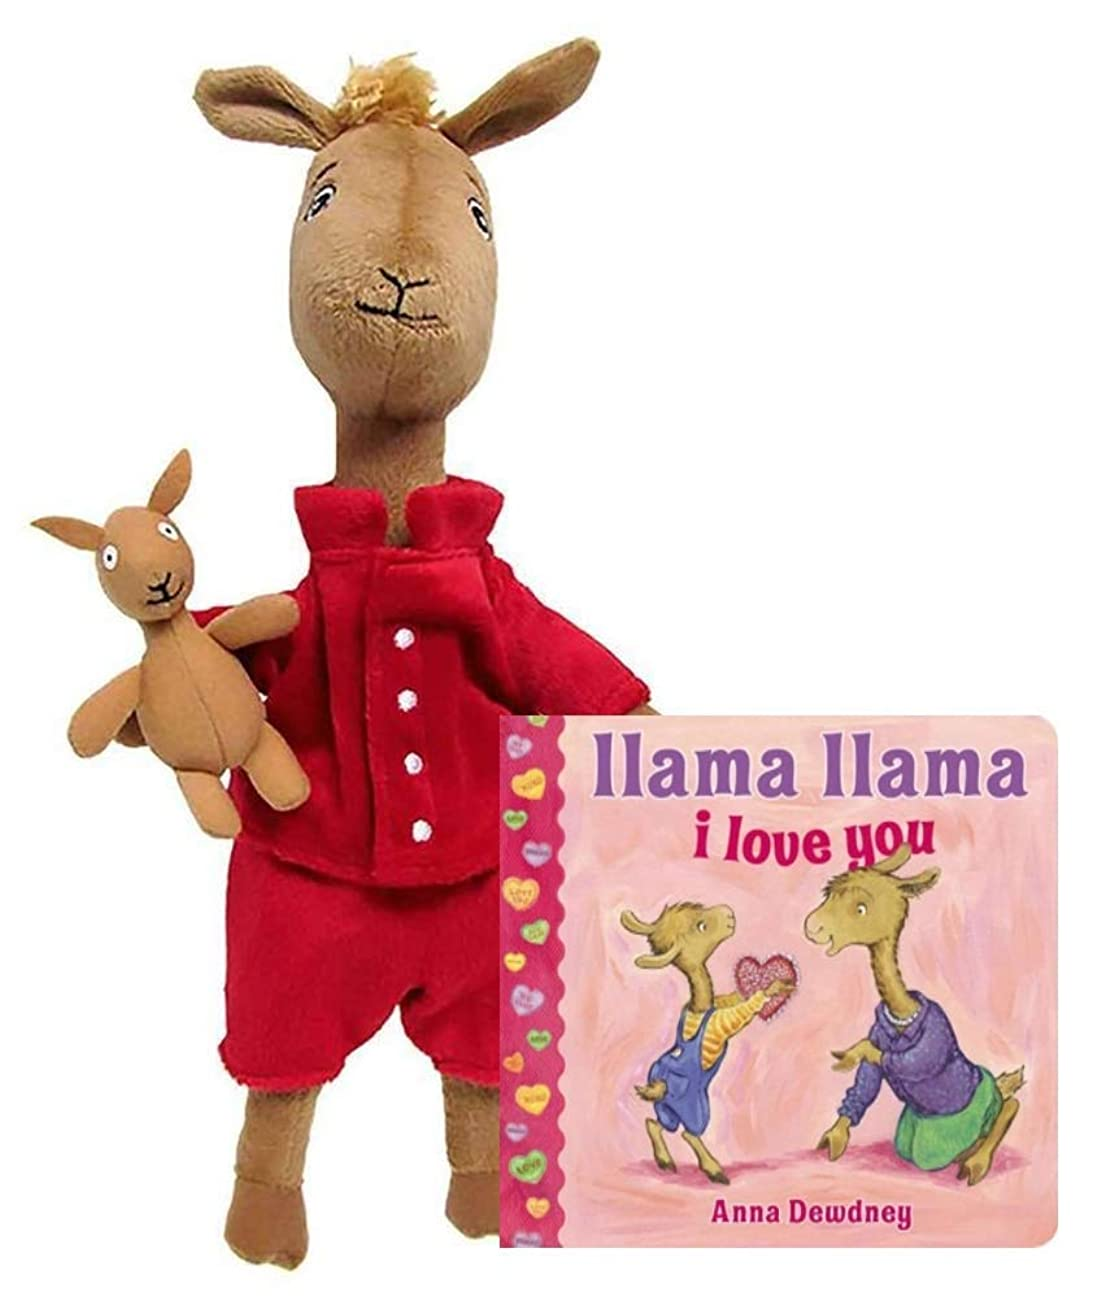 Kids Preferred Llama Llama Red Pajama Large Stuffed Animal Collection (Gift Set)